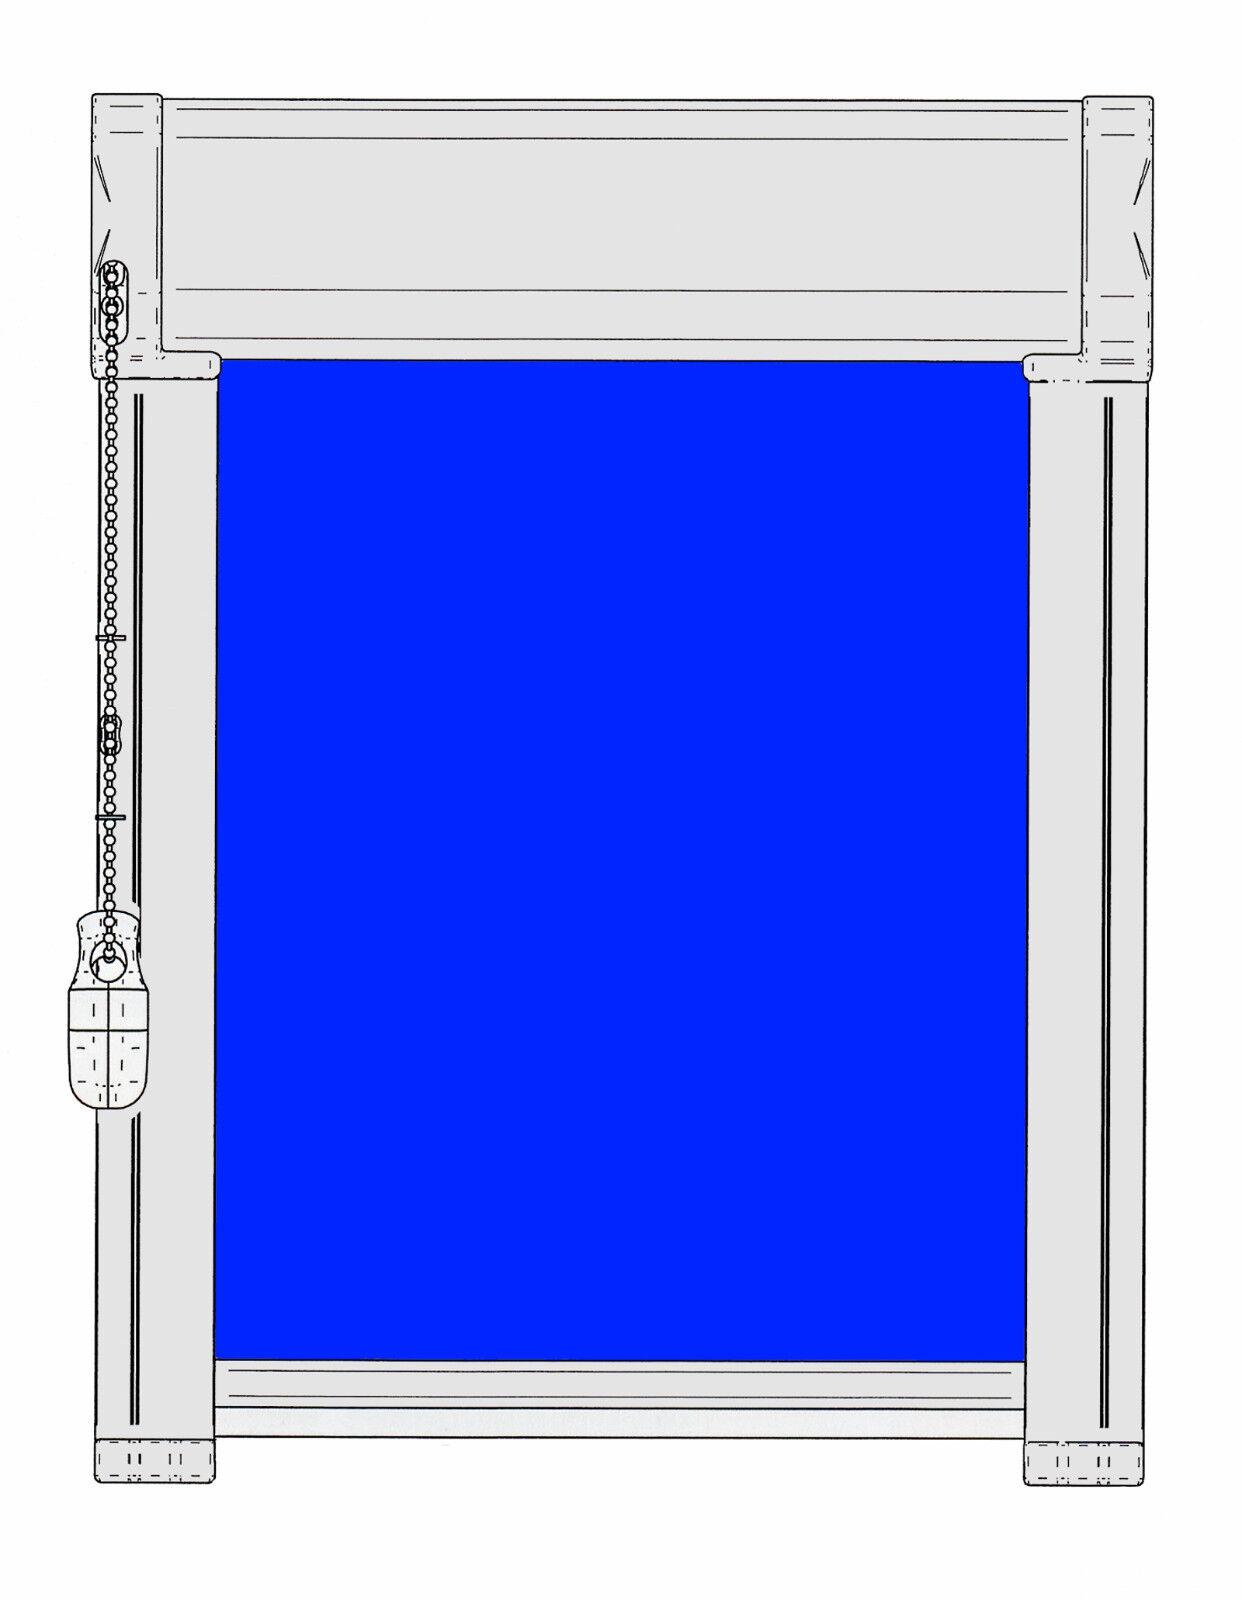 ROLLO ORG Glasleistenrollo Glasleistenrollo Glasleistenrollo Kettenzugrollo Scheibenrollo Verdunklung Klebemontage 2c5870